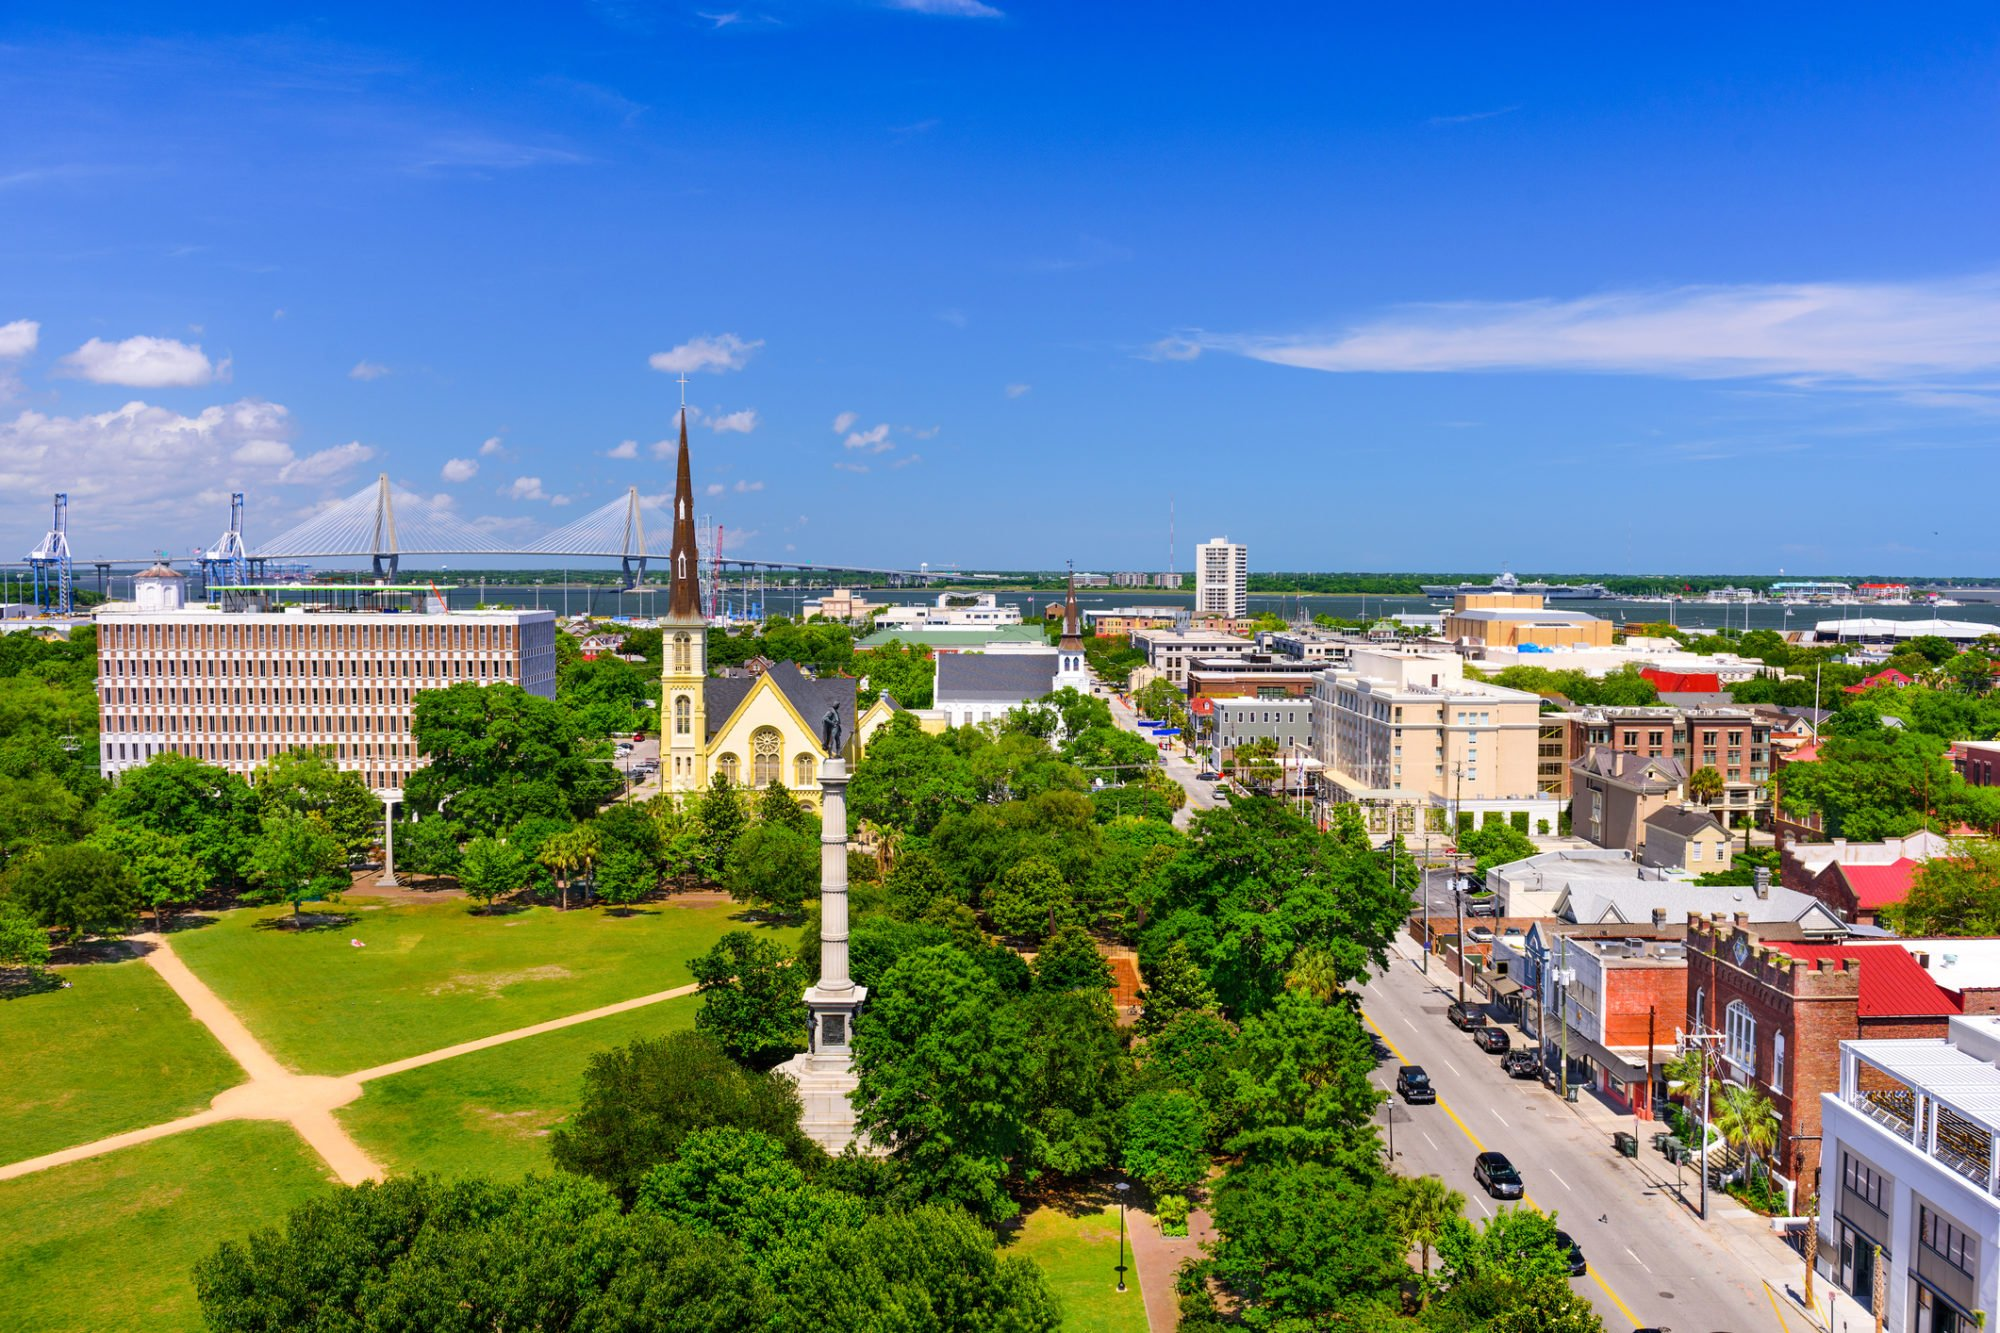 FITSNews – Liberal Activists Target John C. Calhoun Statue In Charleston, S.C.